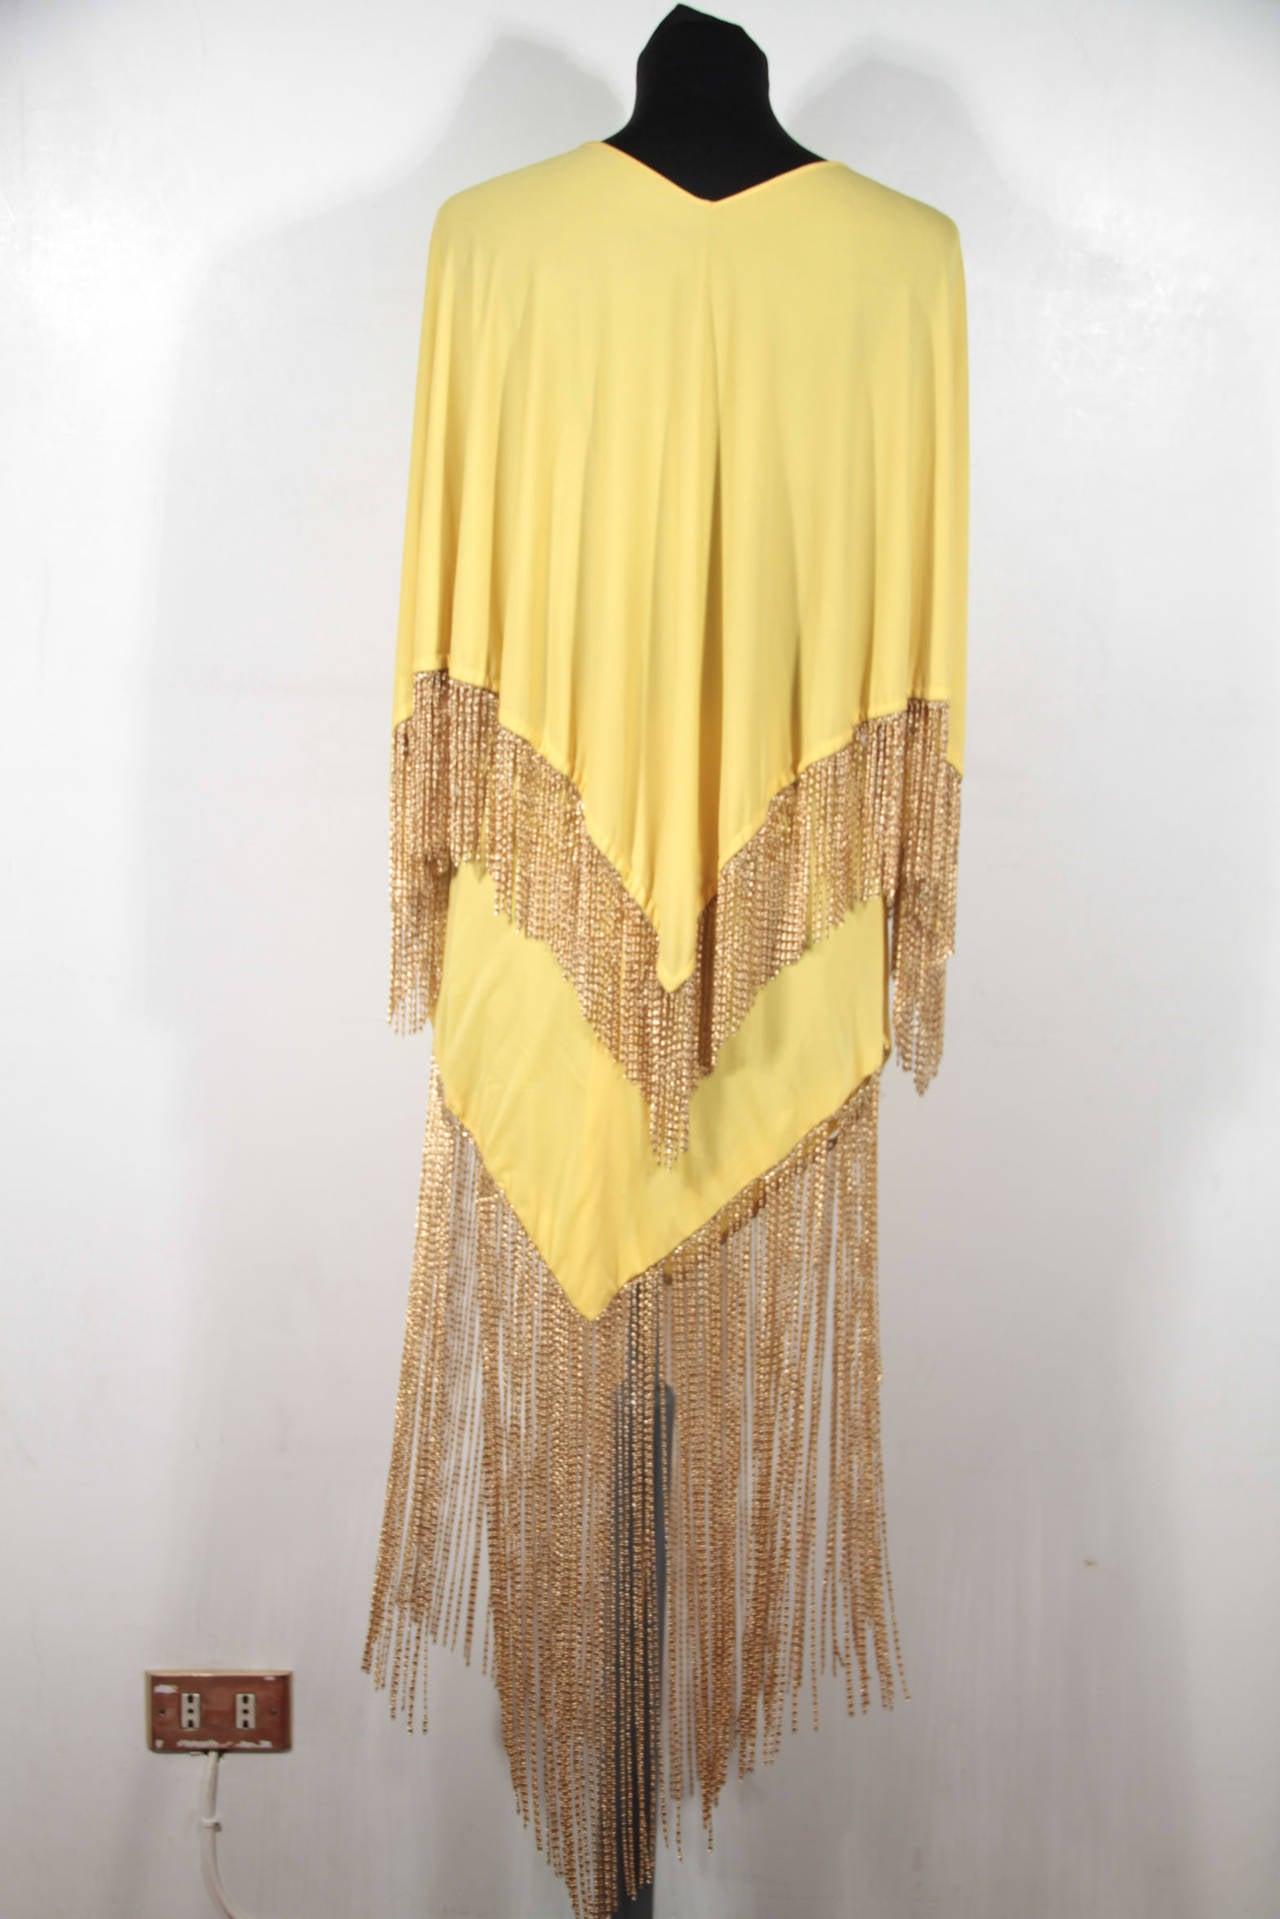 LORIS AZZARO Vintage 70s Yellow CAPE TOP & SKIRT SET Dress Long CHAIN FRINGES 4